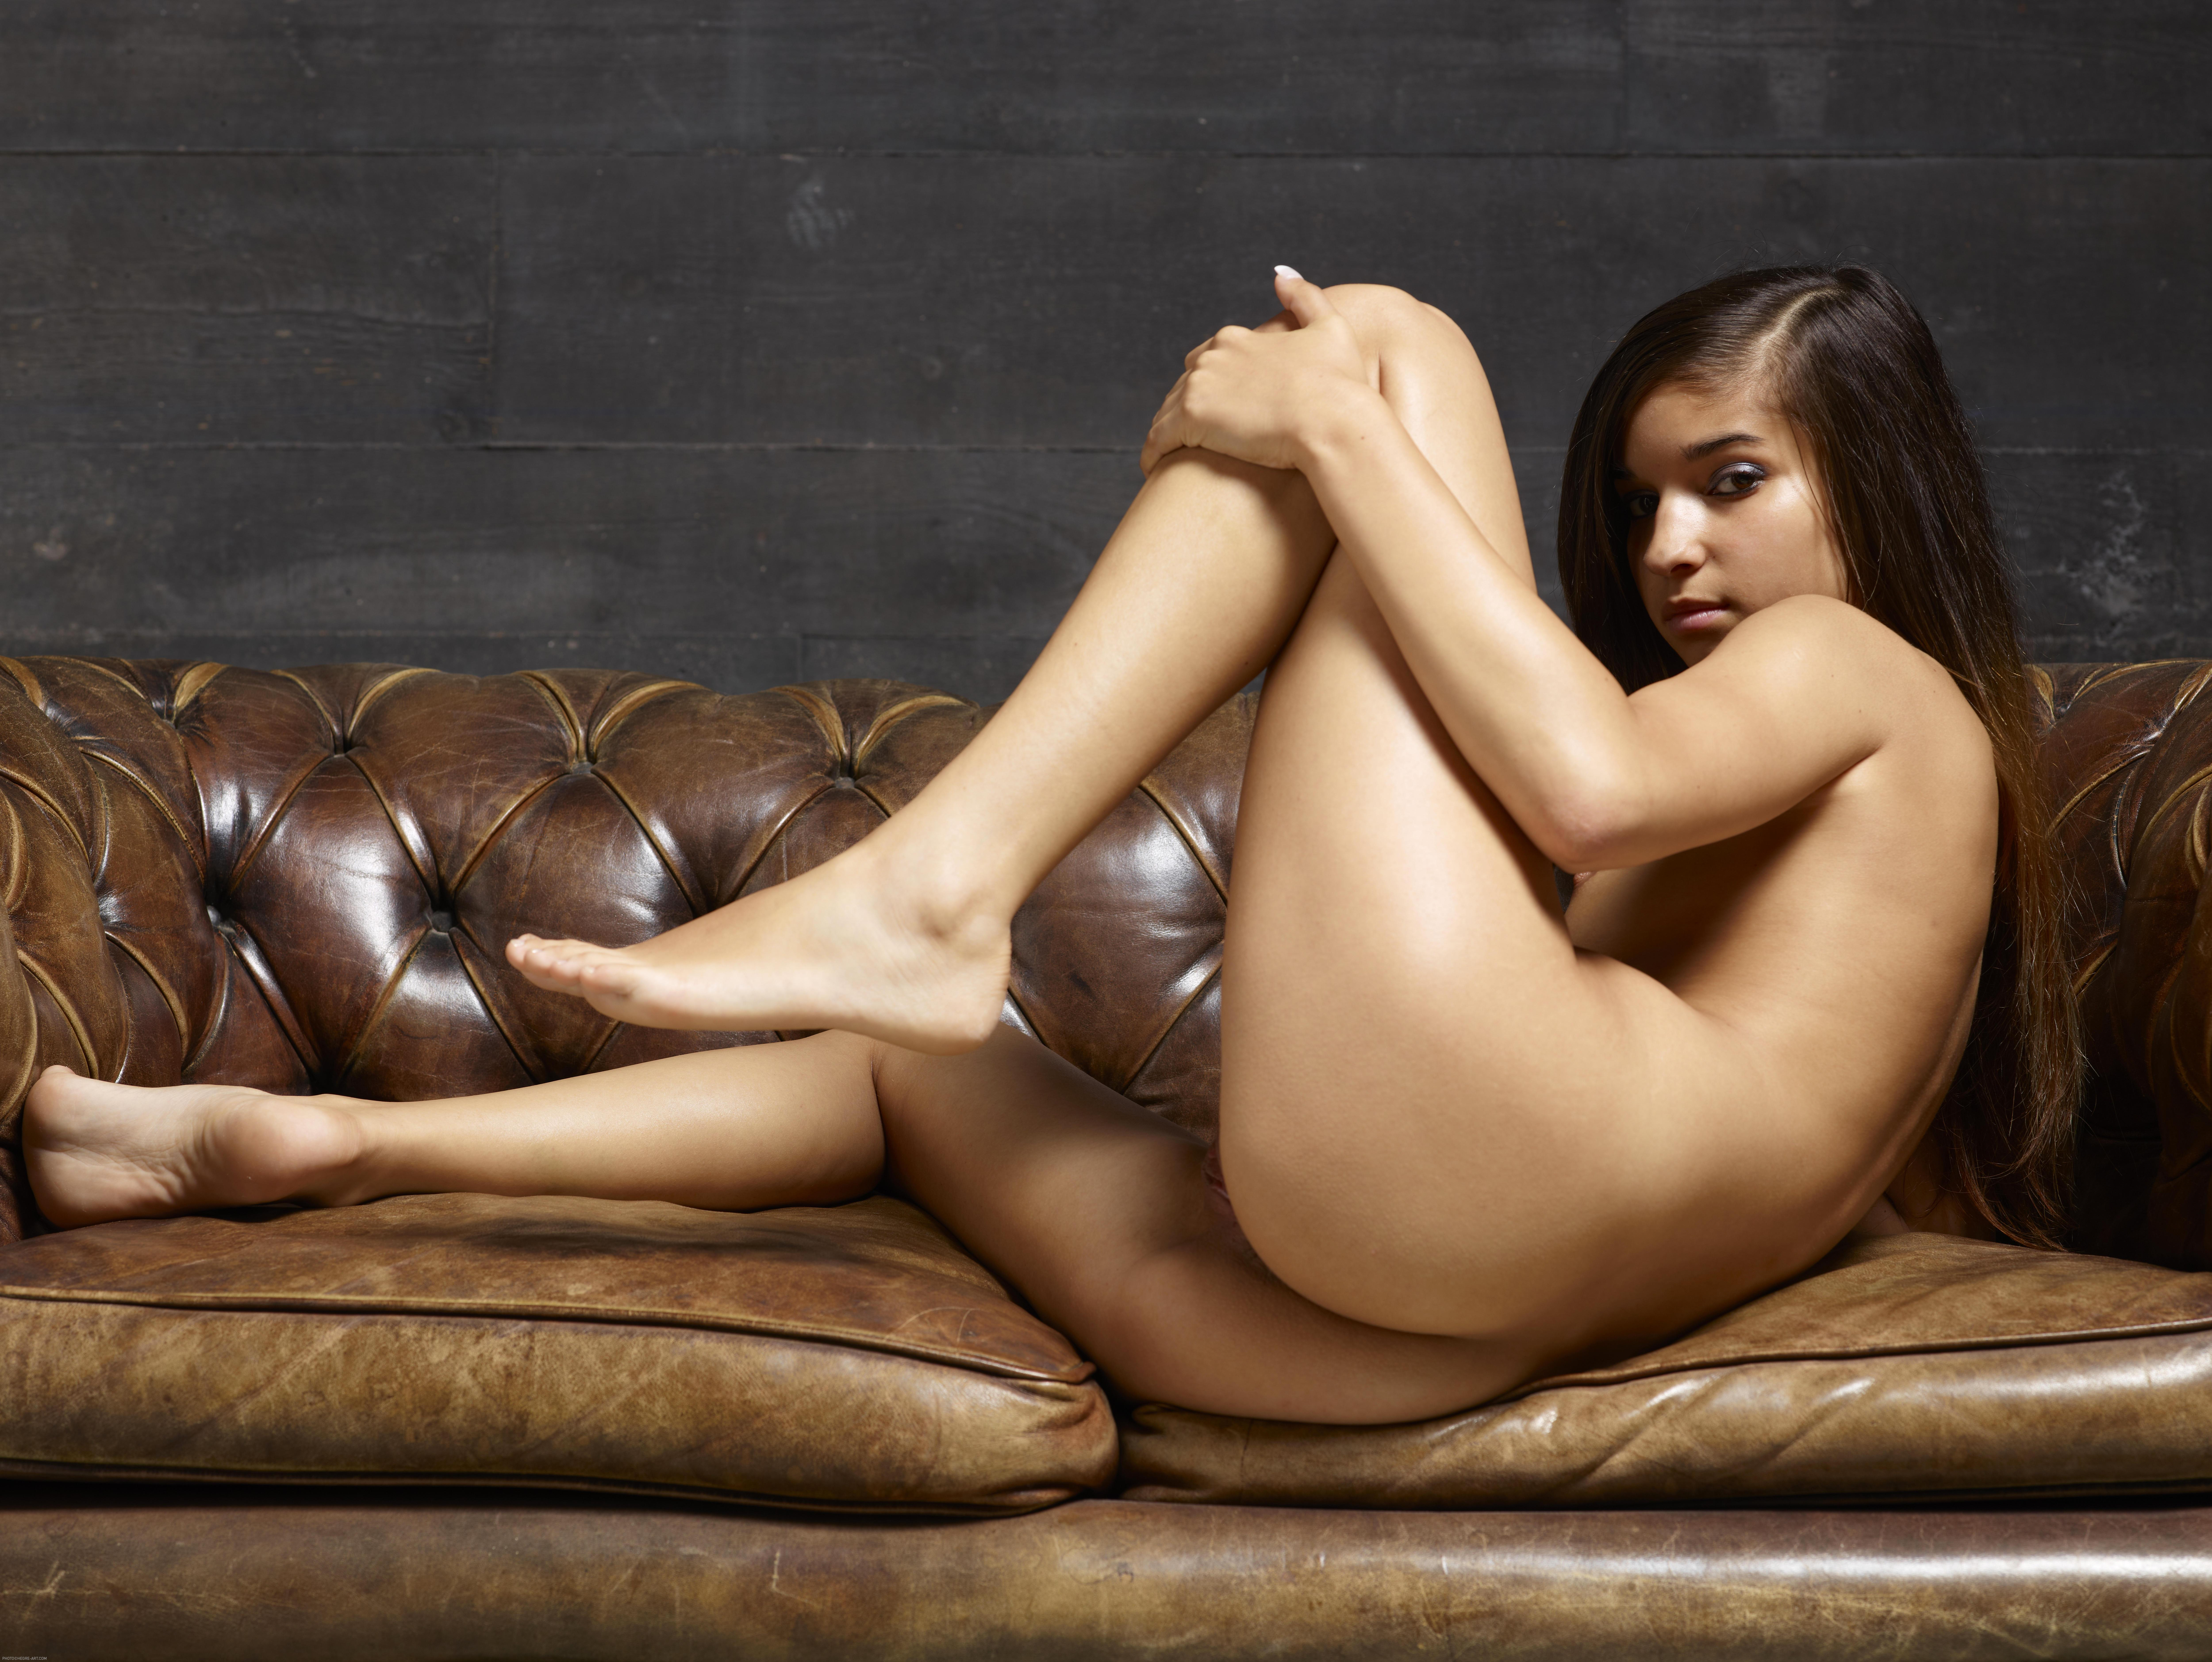 Long time nikola sensual touch mine very